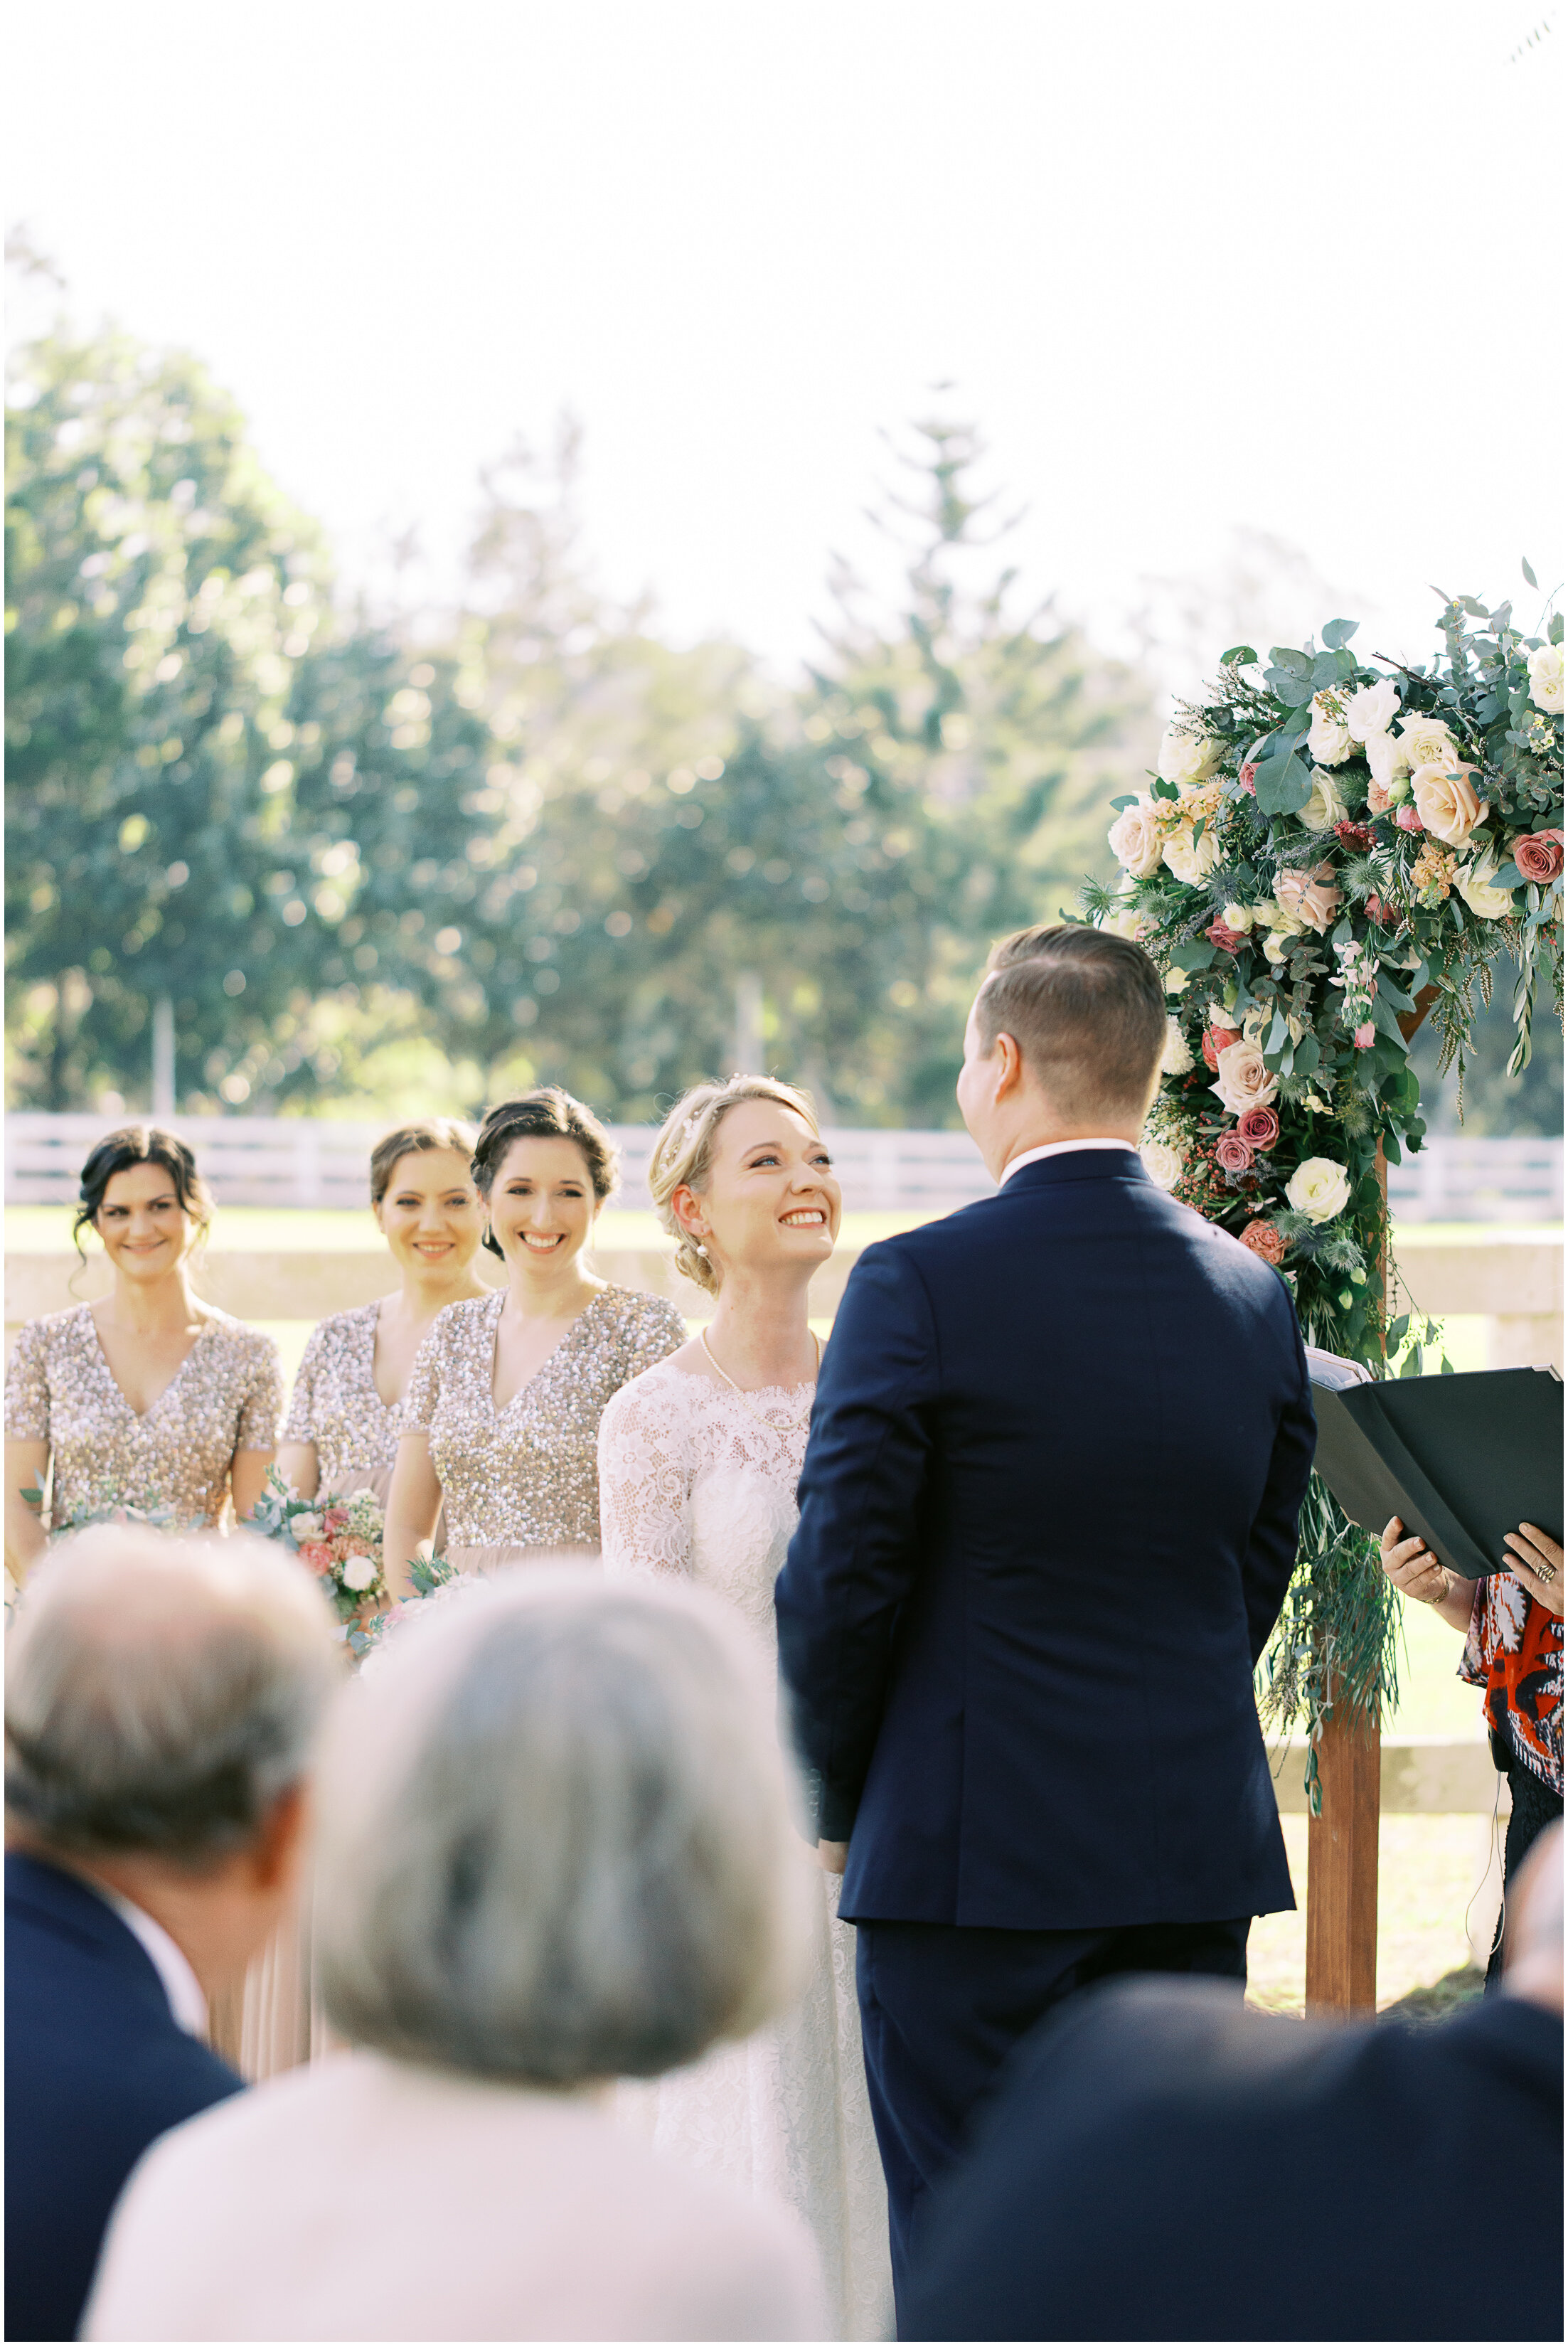 brisbane-fine-art-wedding-photographer-lauren-olivia-luxury-wedding-australia-08.jpg